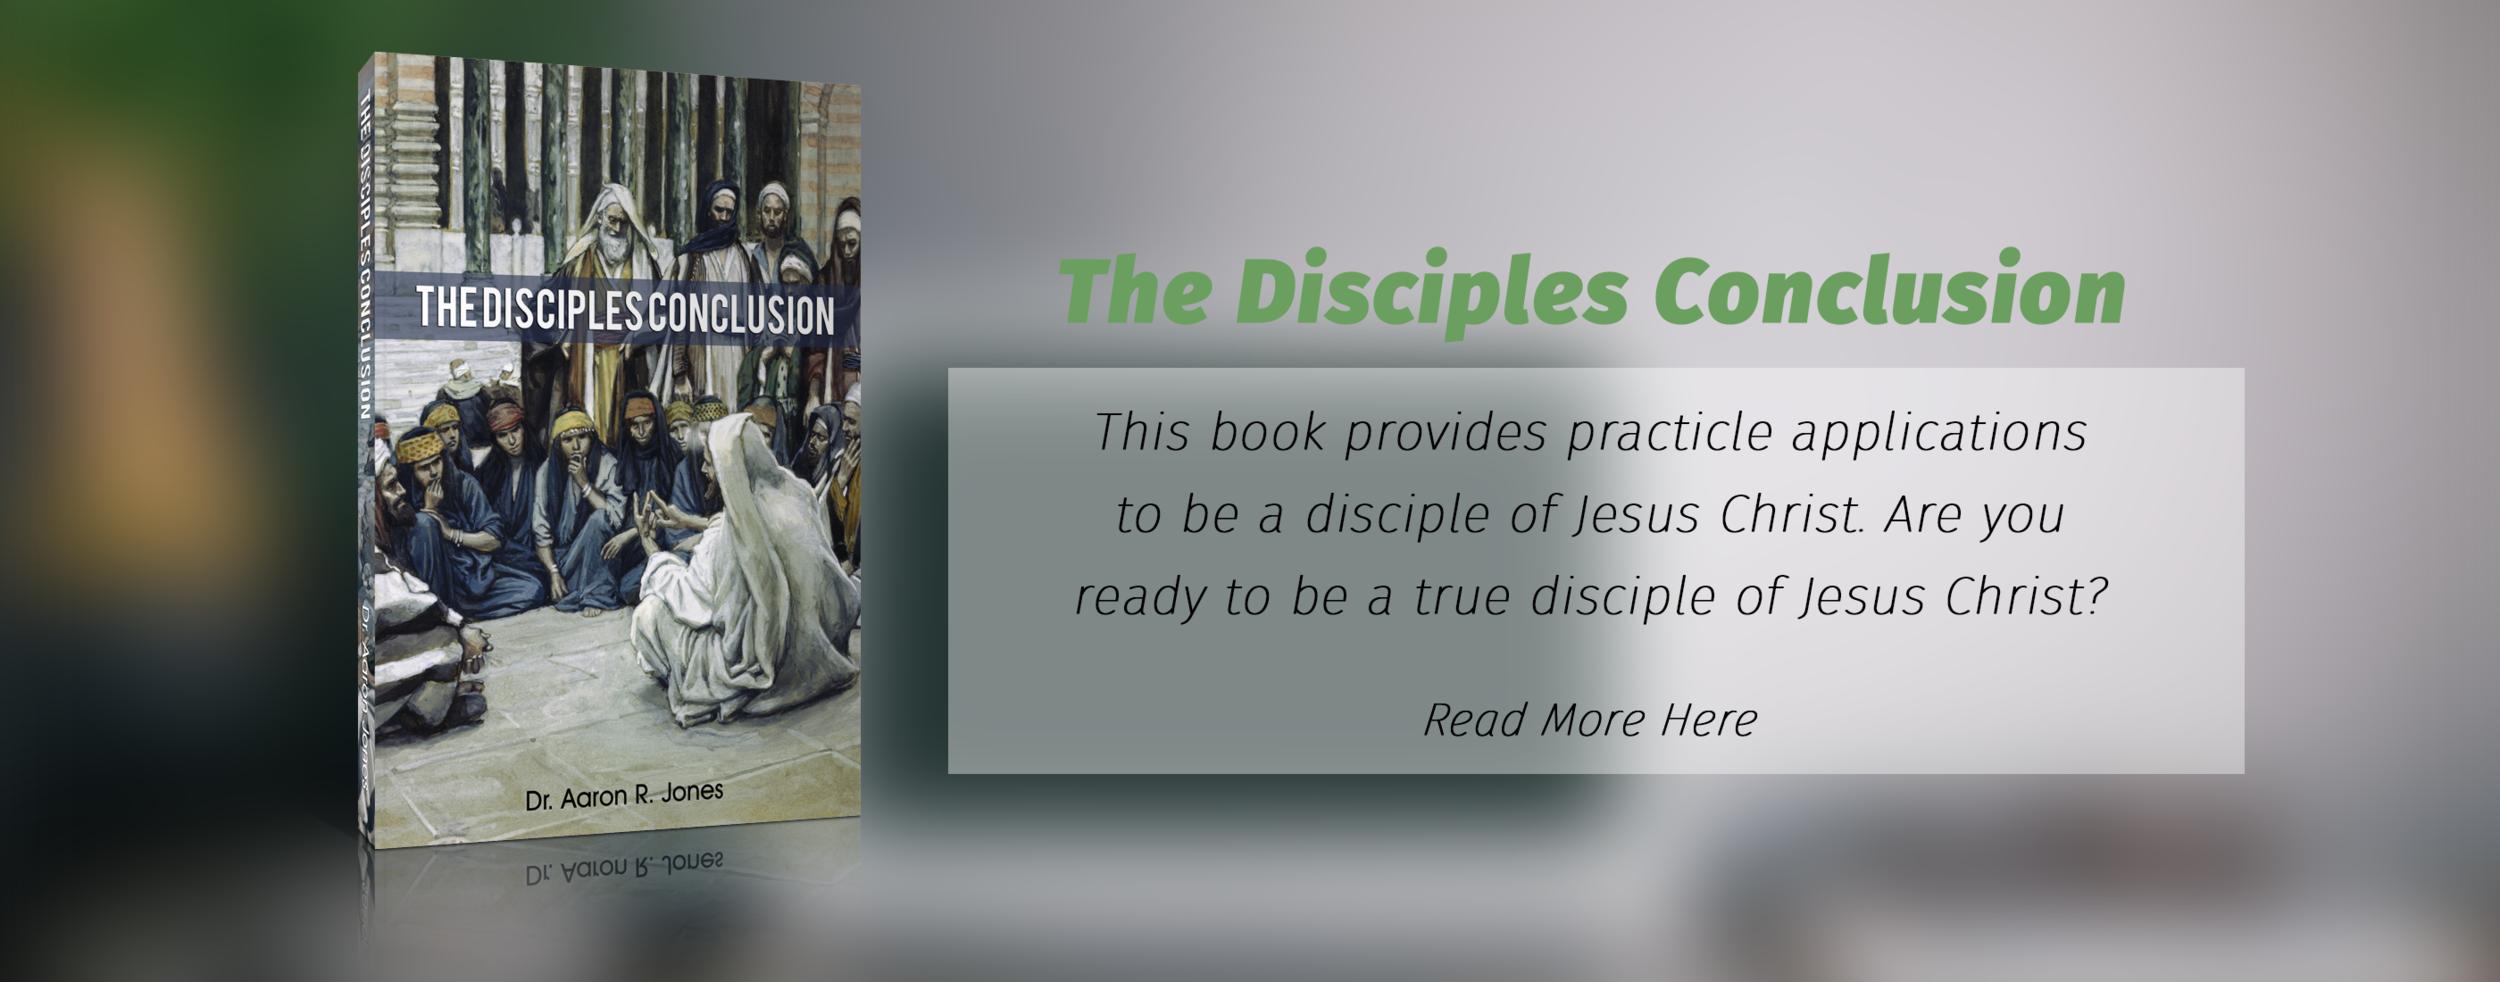 discipleshipstripe1.png